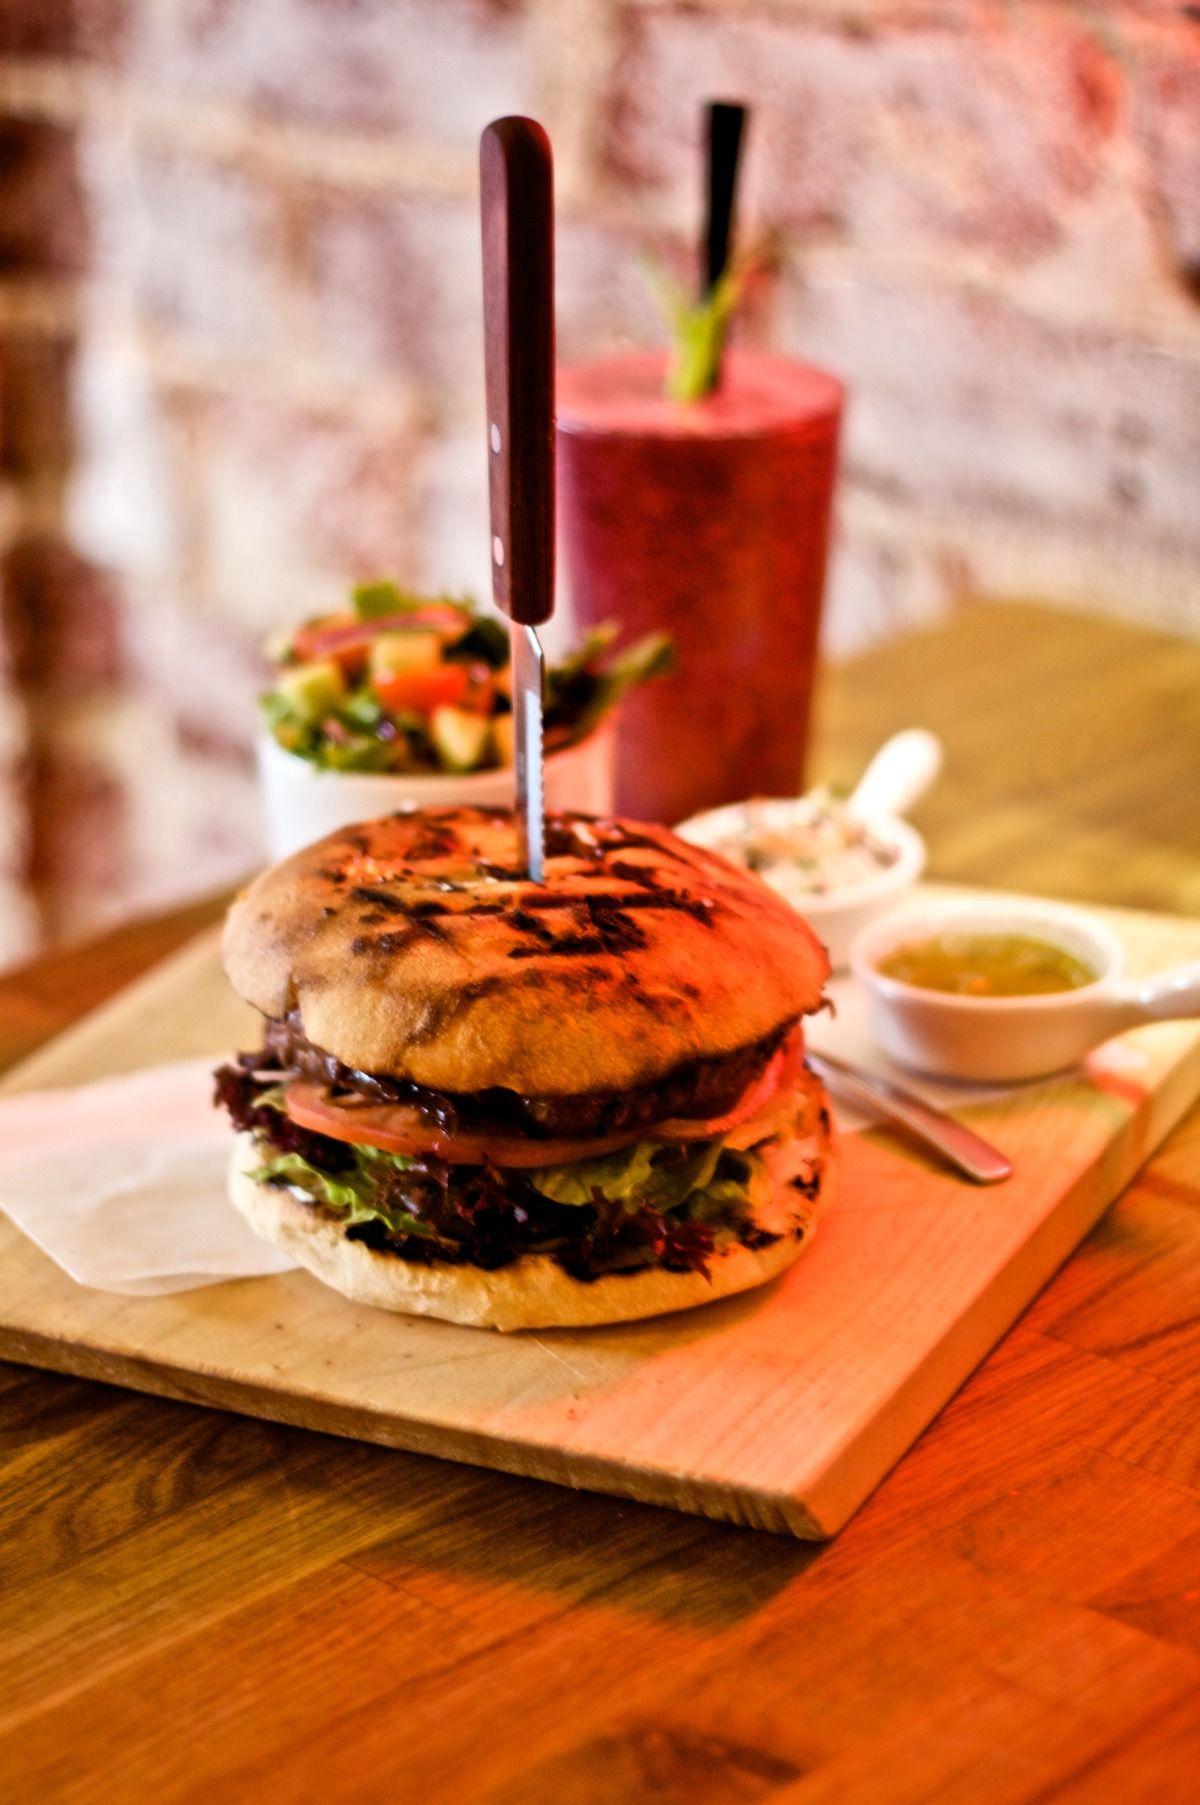 Jus burgers celebratewa food jus eat